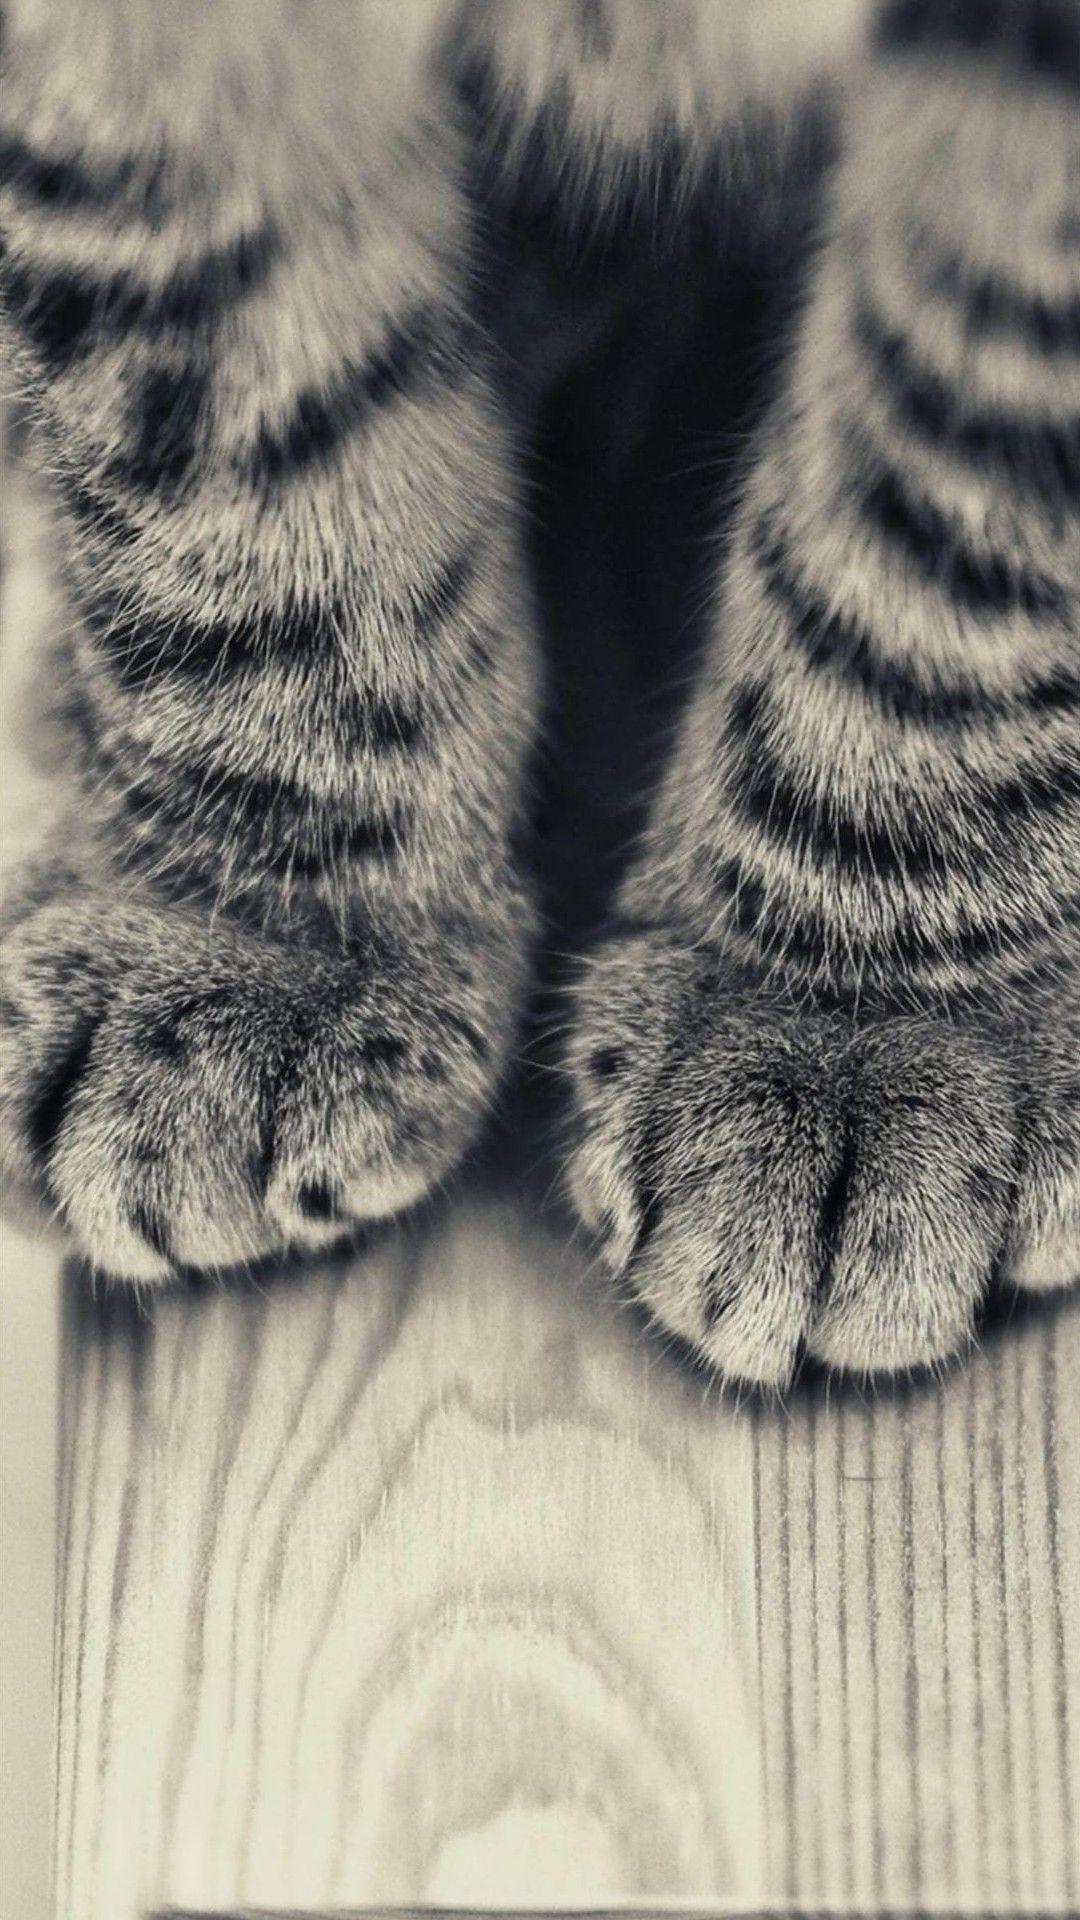 Animal Galaxy S4 Wallpapers Hd 79 Iphone Wallpaper Kitten